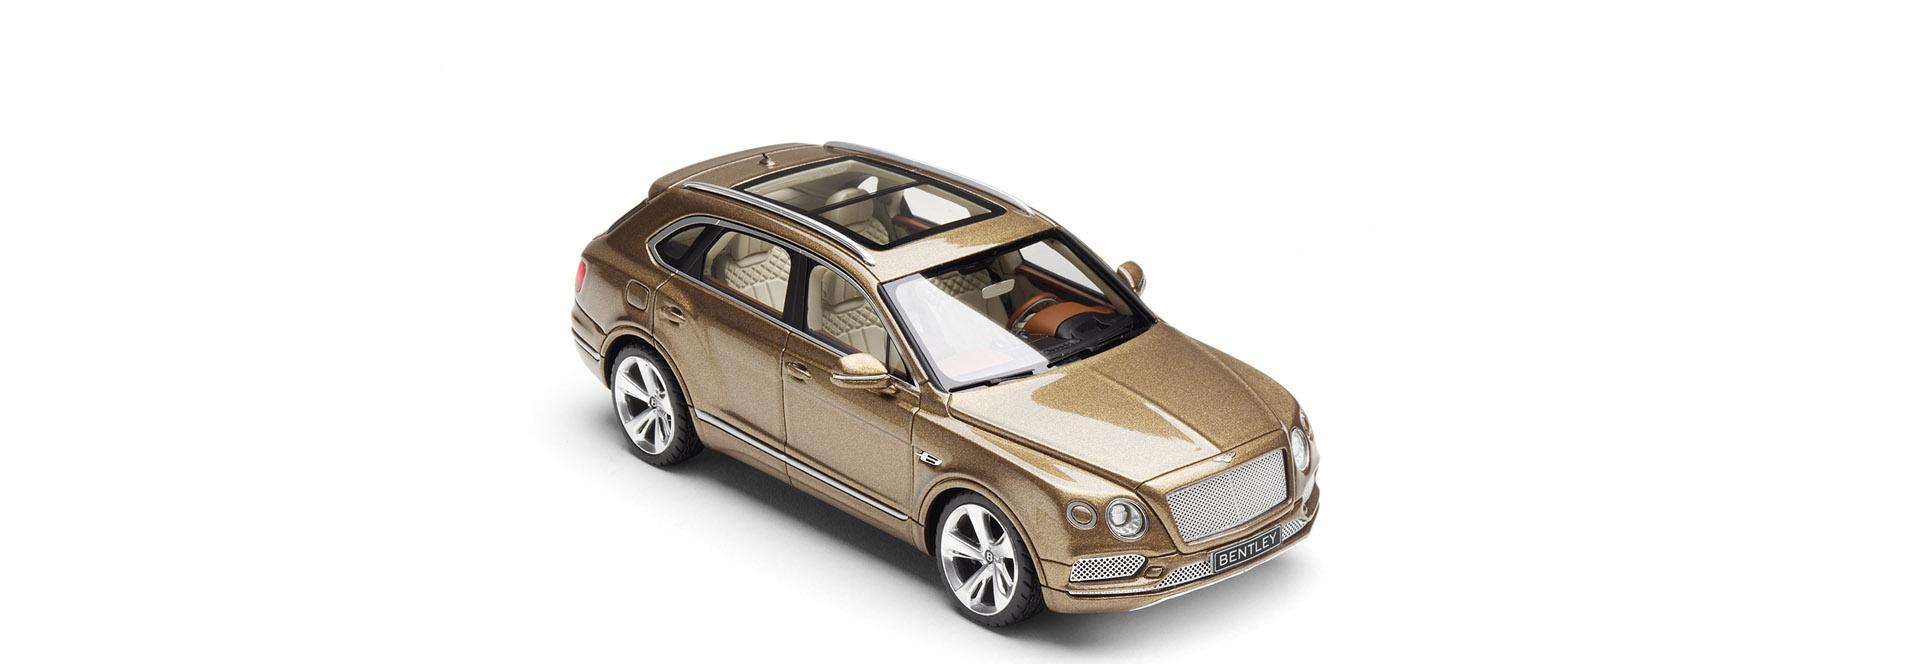 Handbags Fragrances  More Bentley CollectionBentley Motors